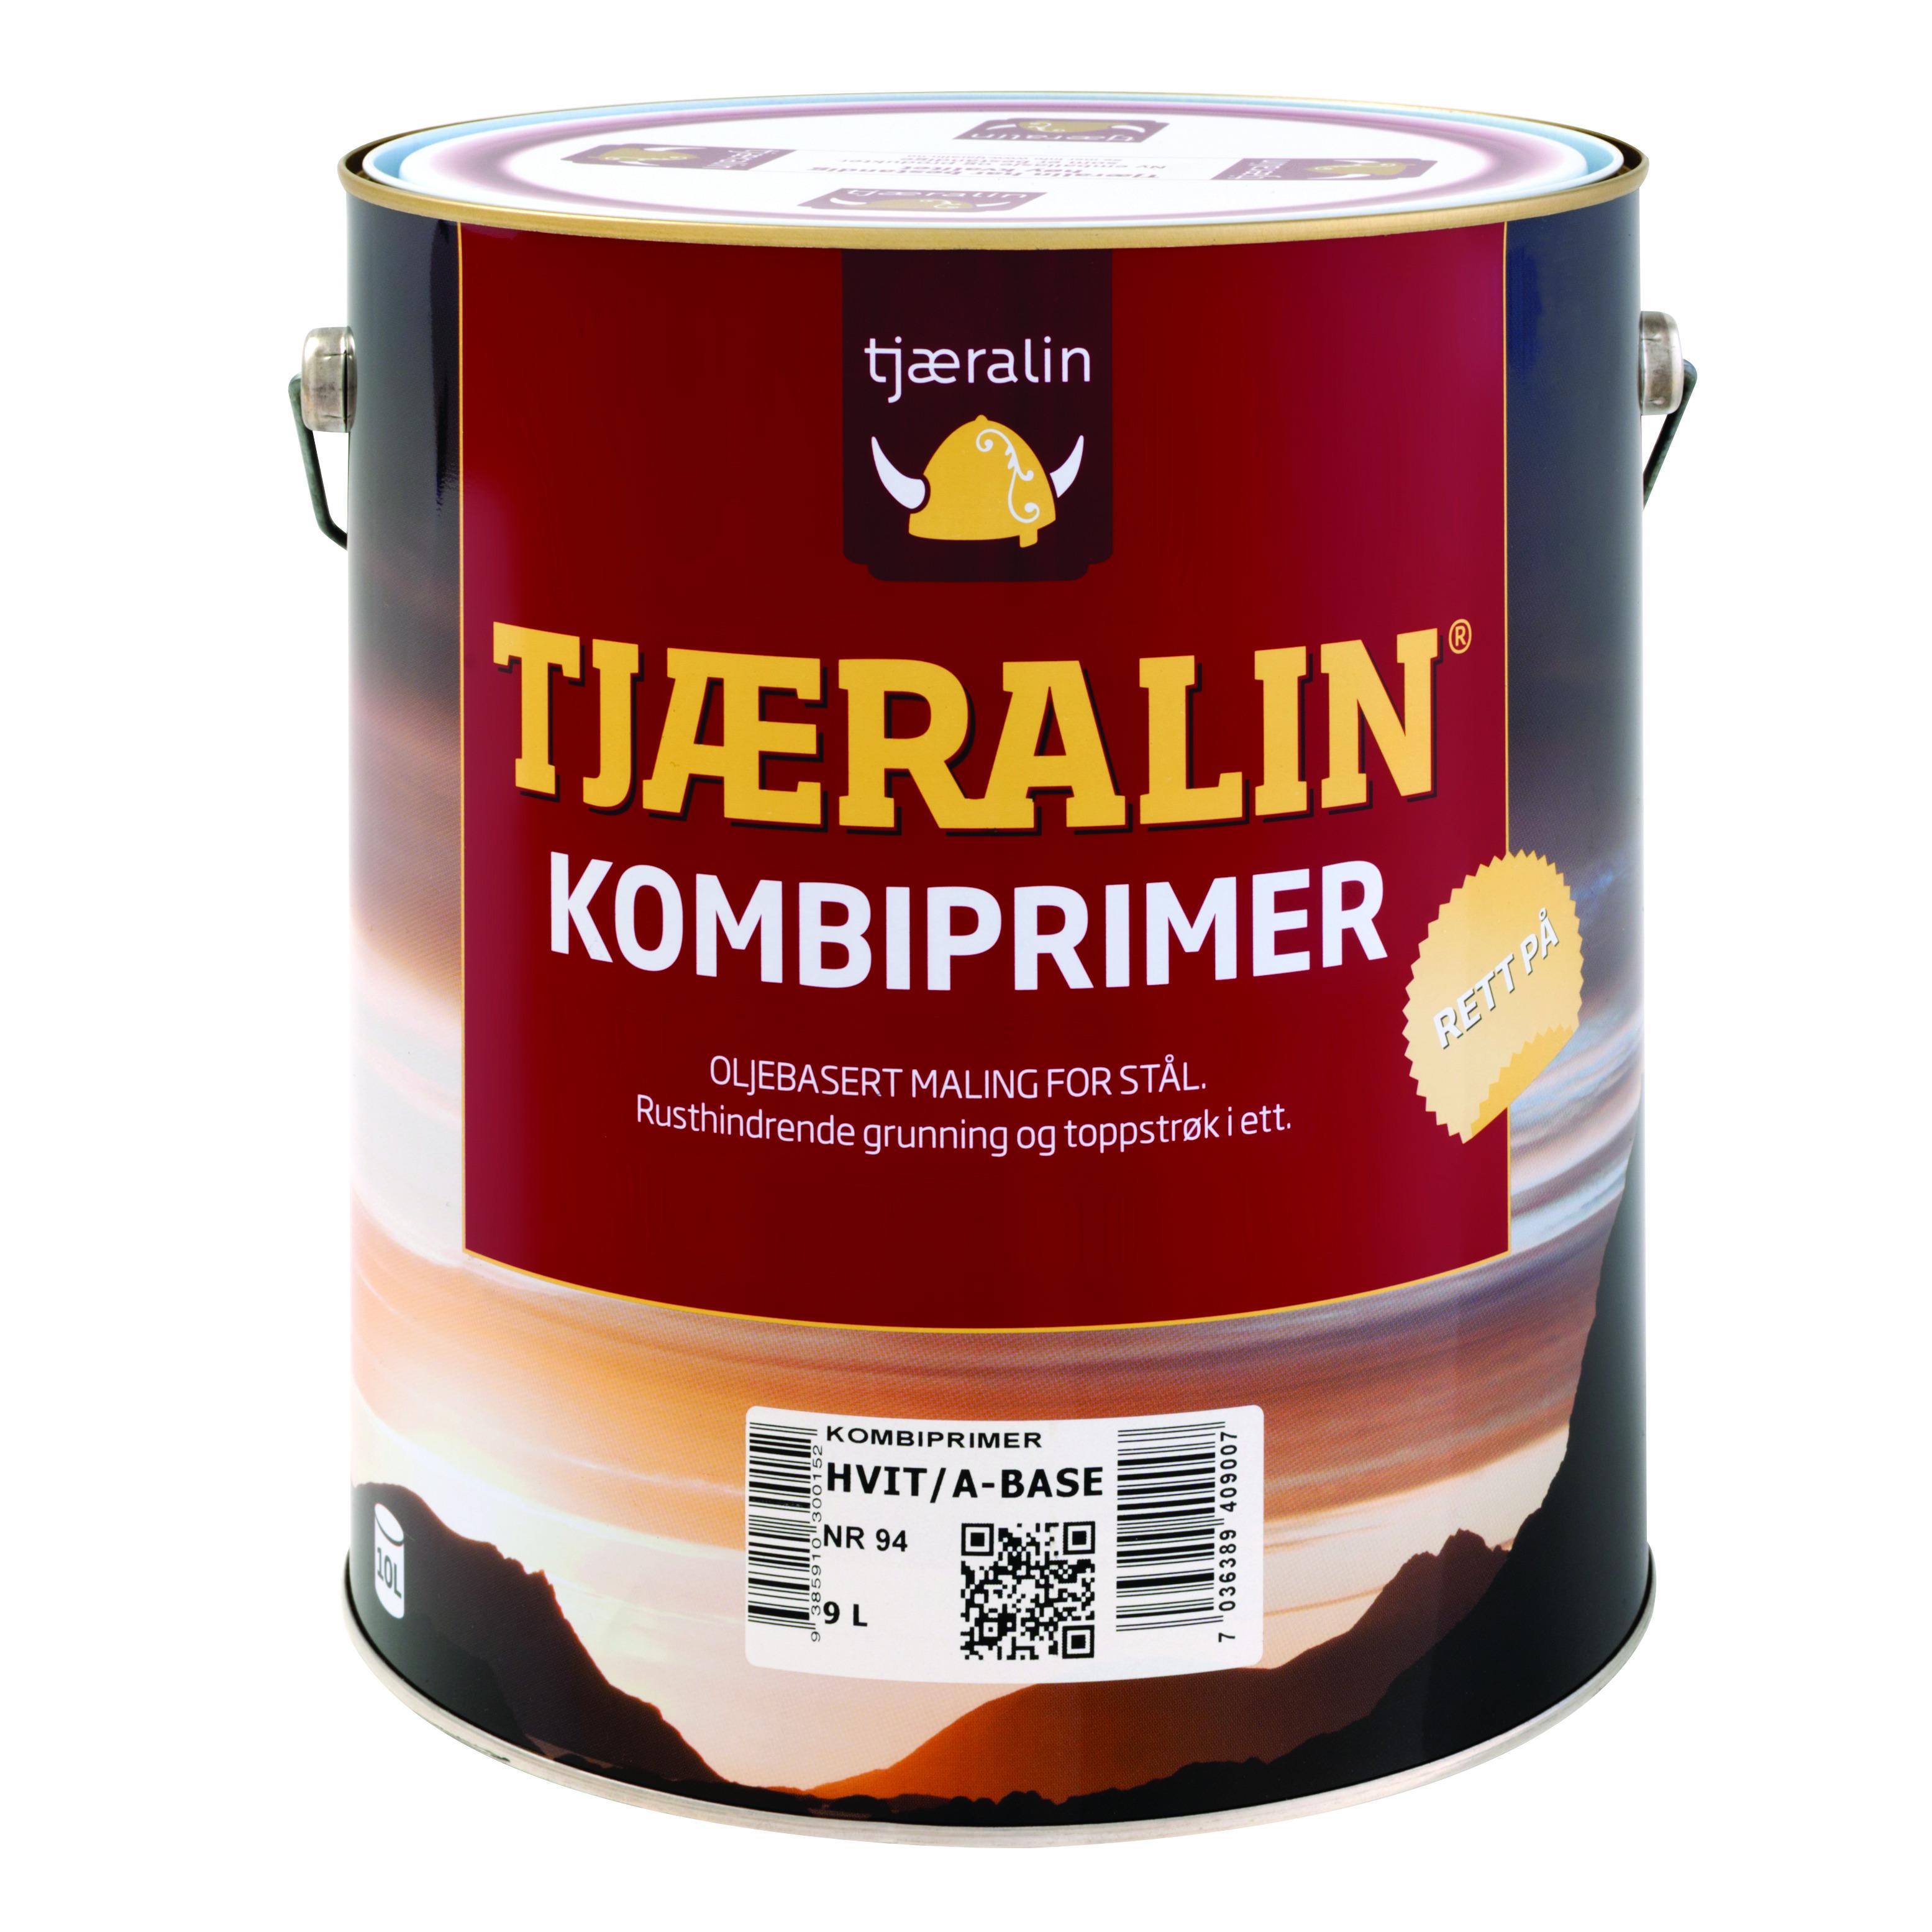 15-12-2016_Kombiprimer 10 liter.jpg